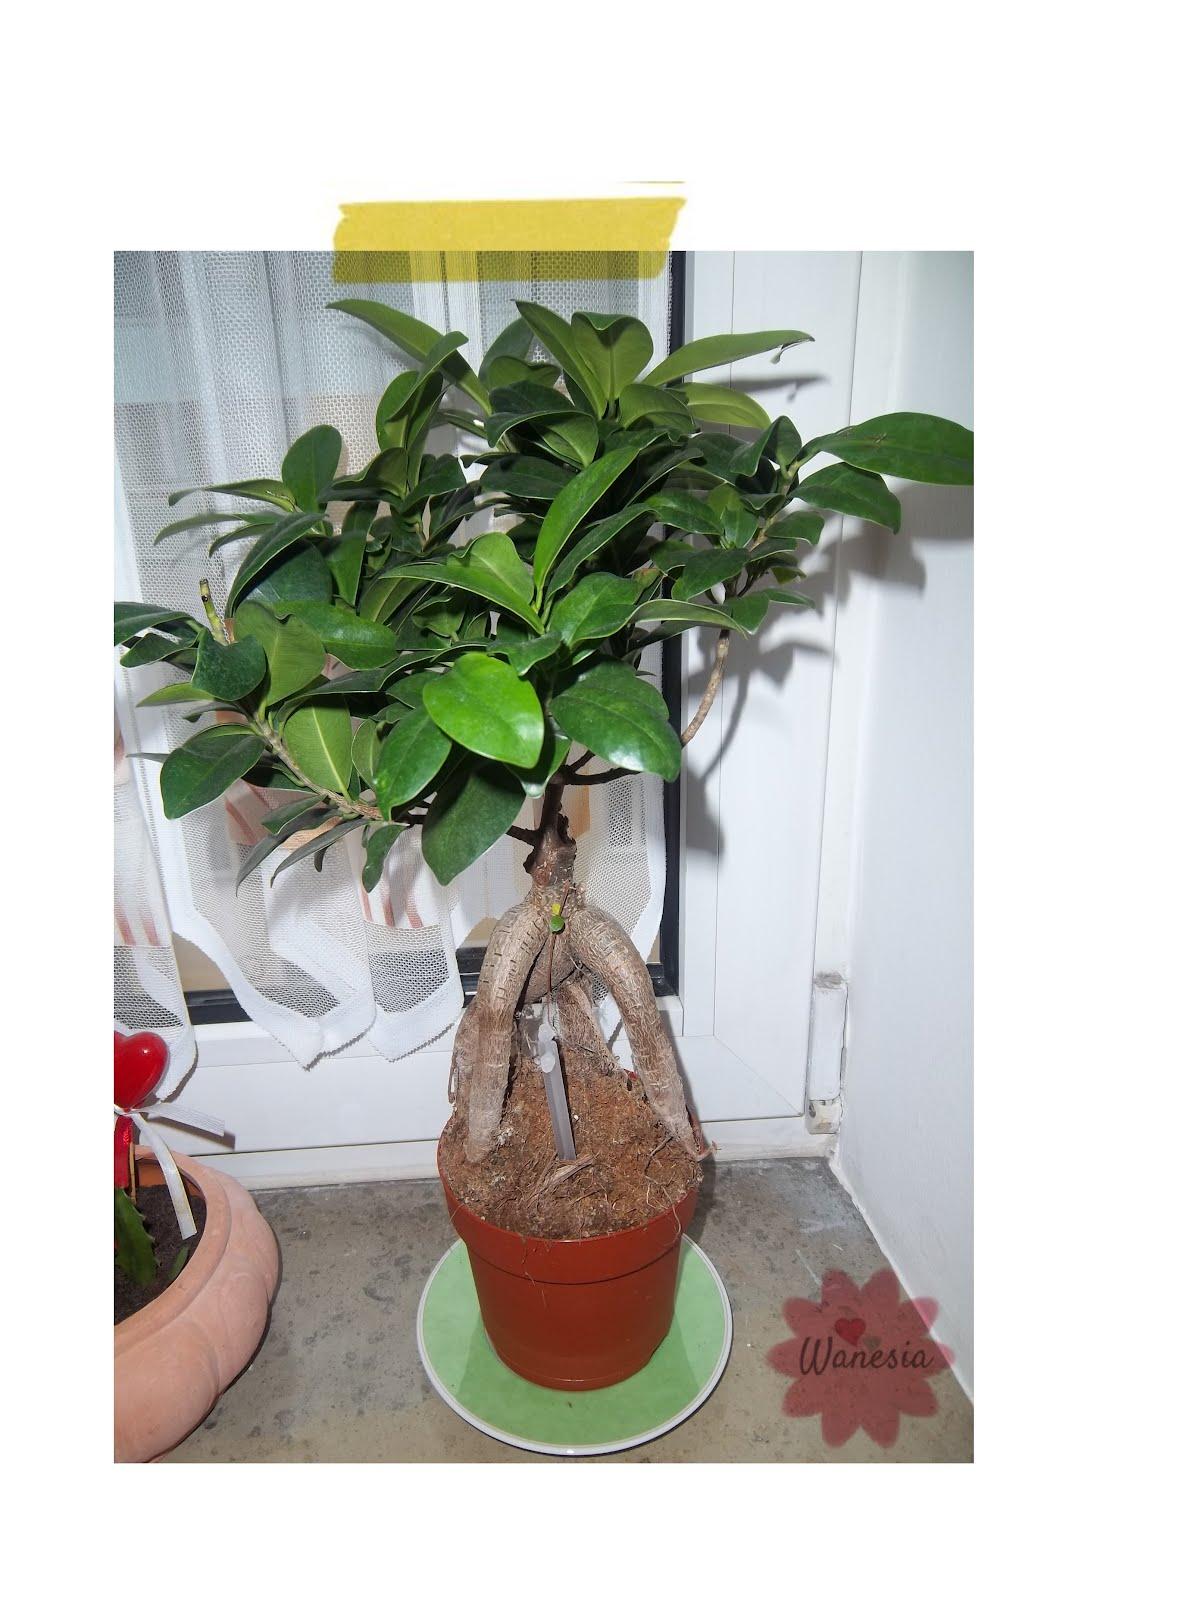 Una Scultura Chiamata Ficus Ginseng WANESIA